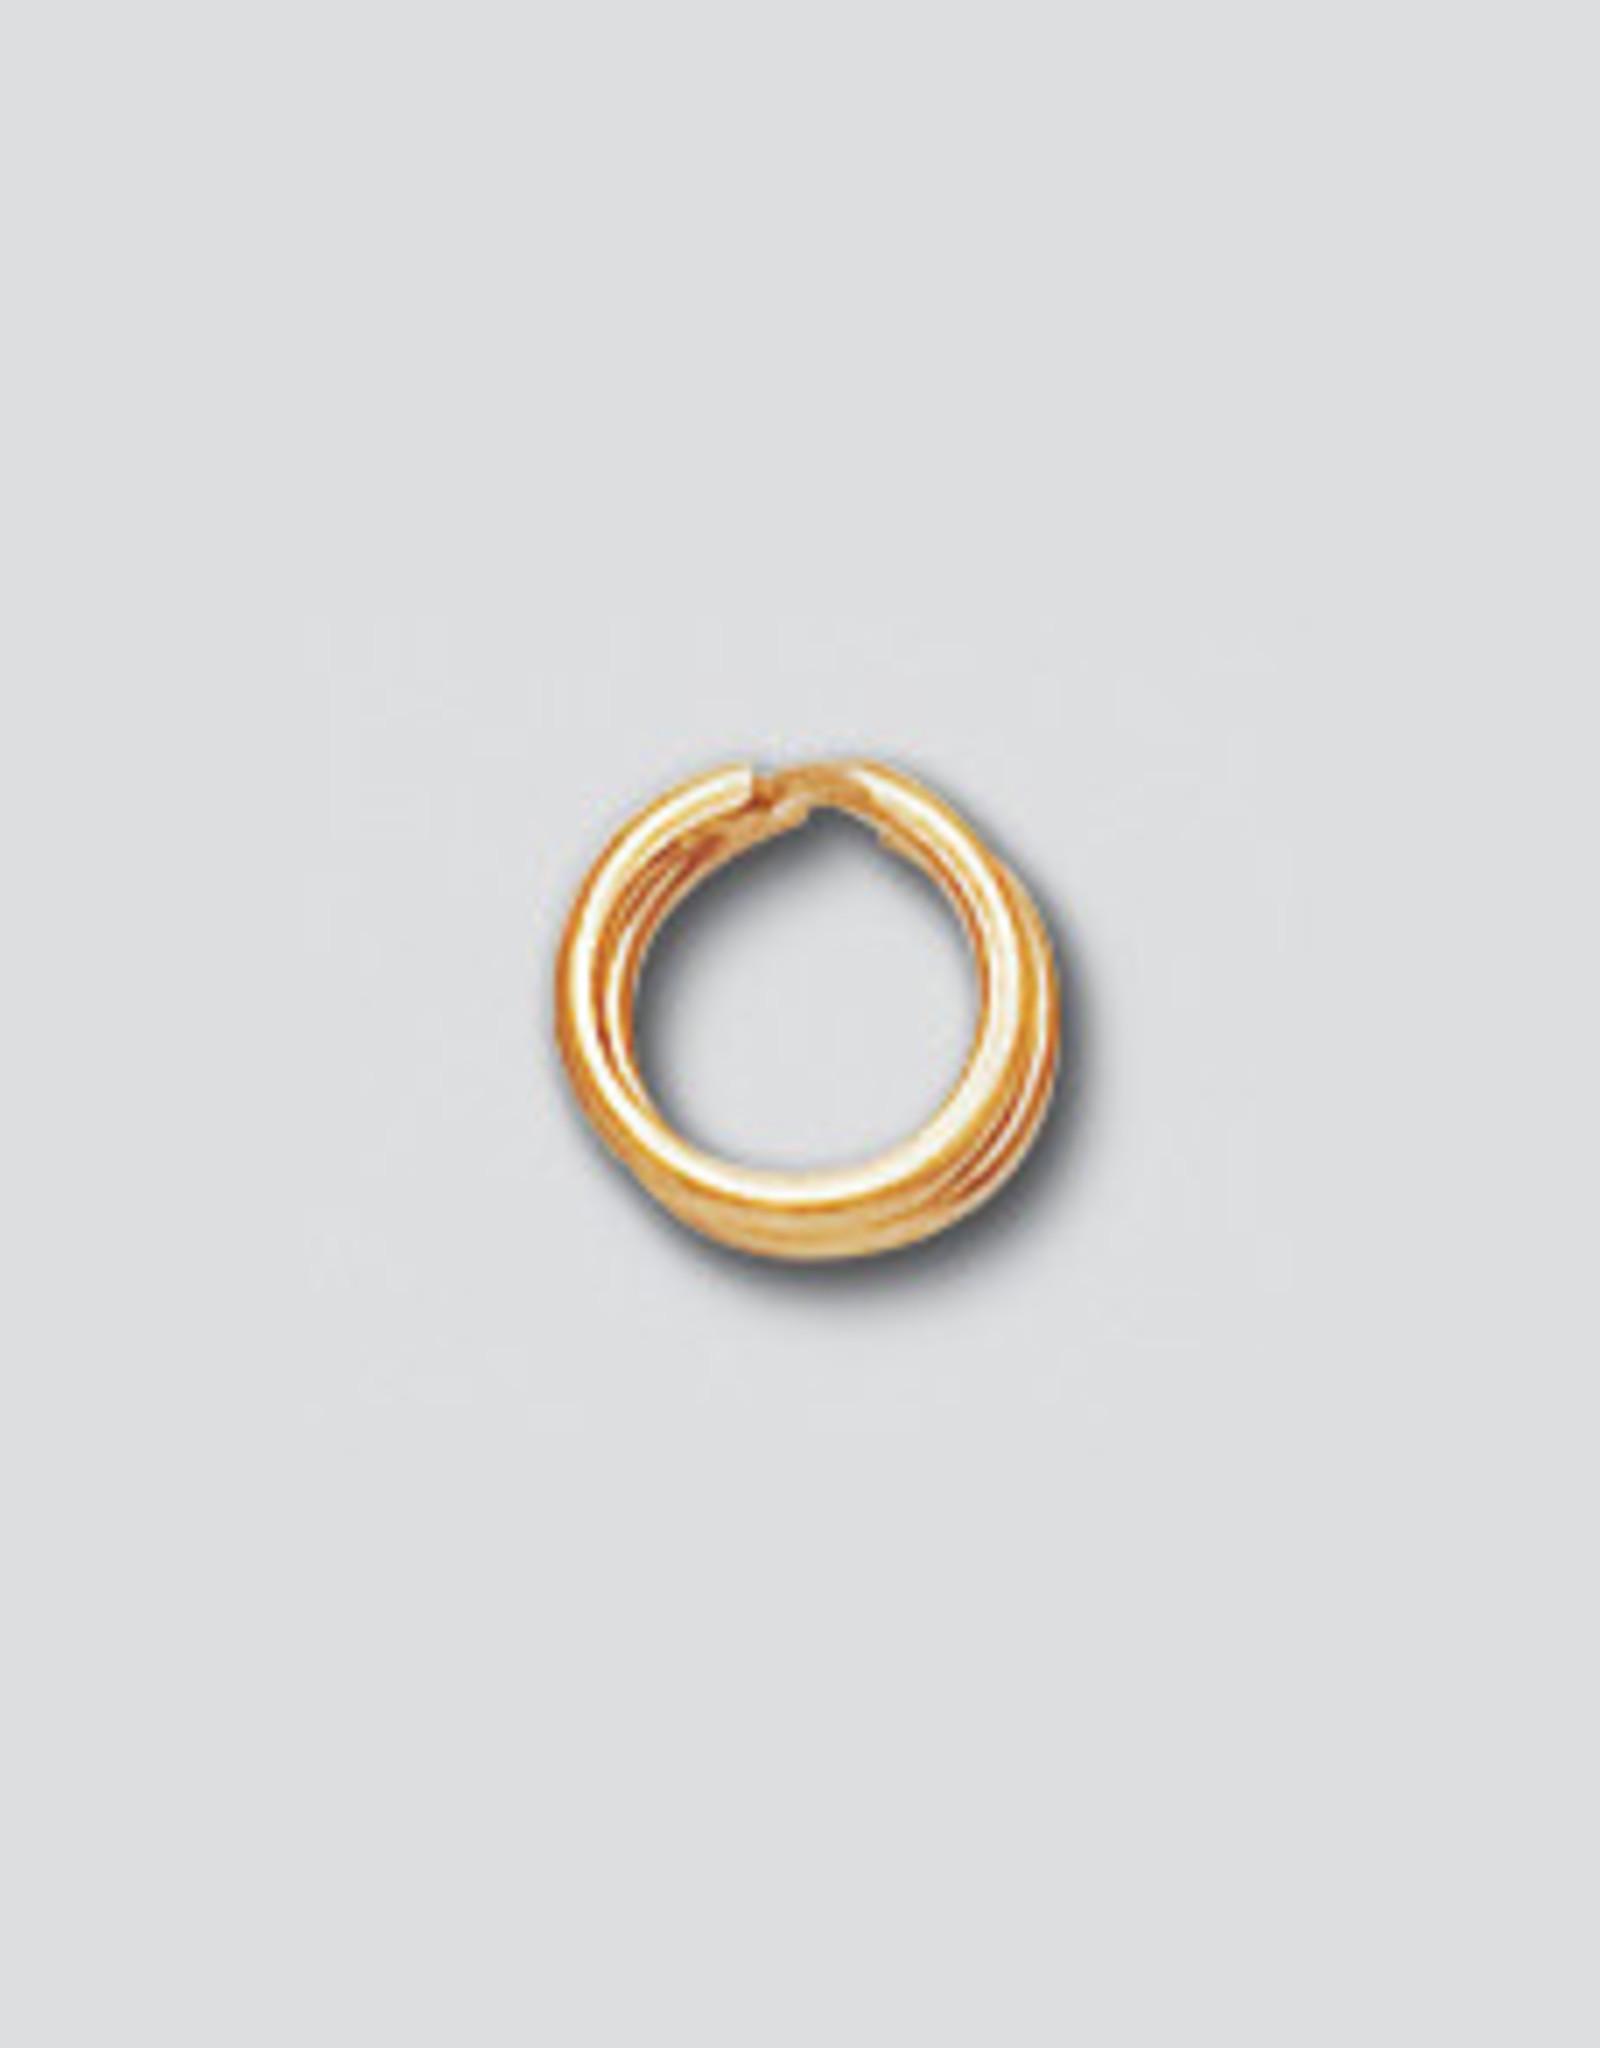 6mm Split Rings 14k Gold Filled Qty 6